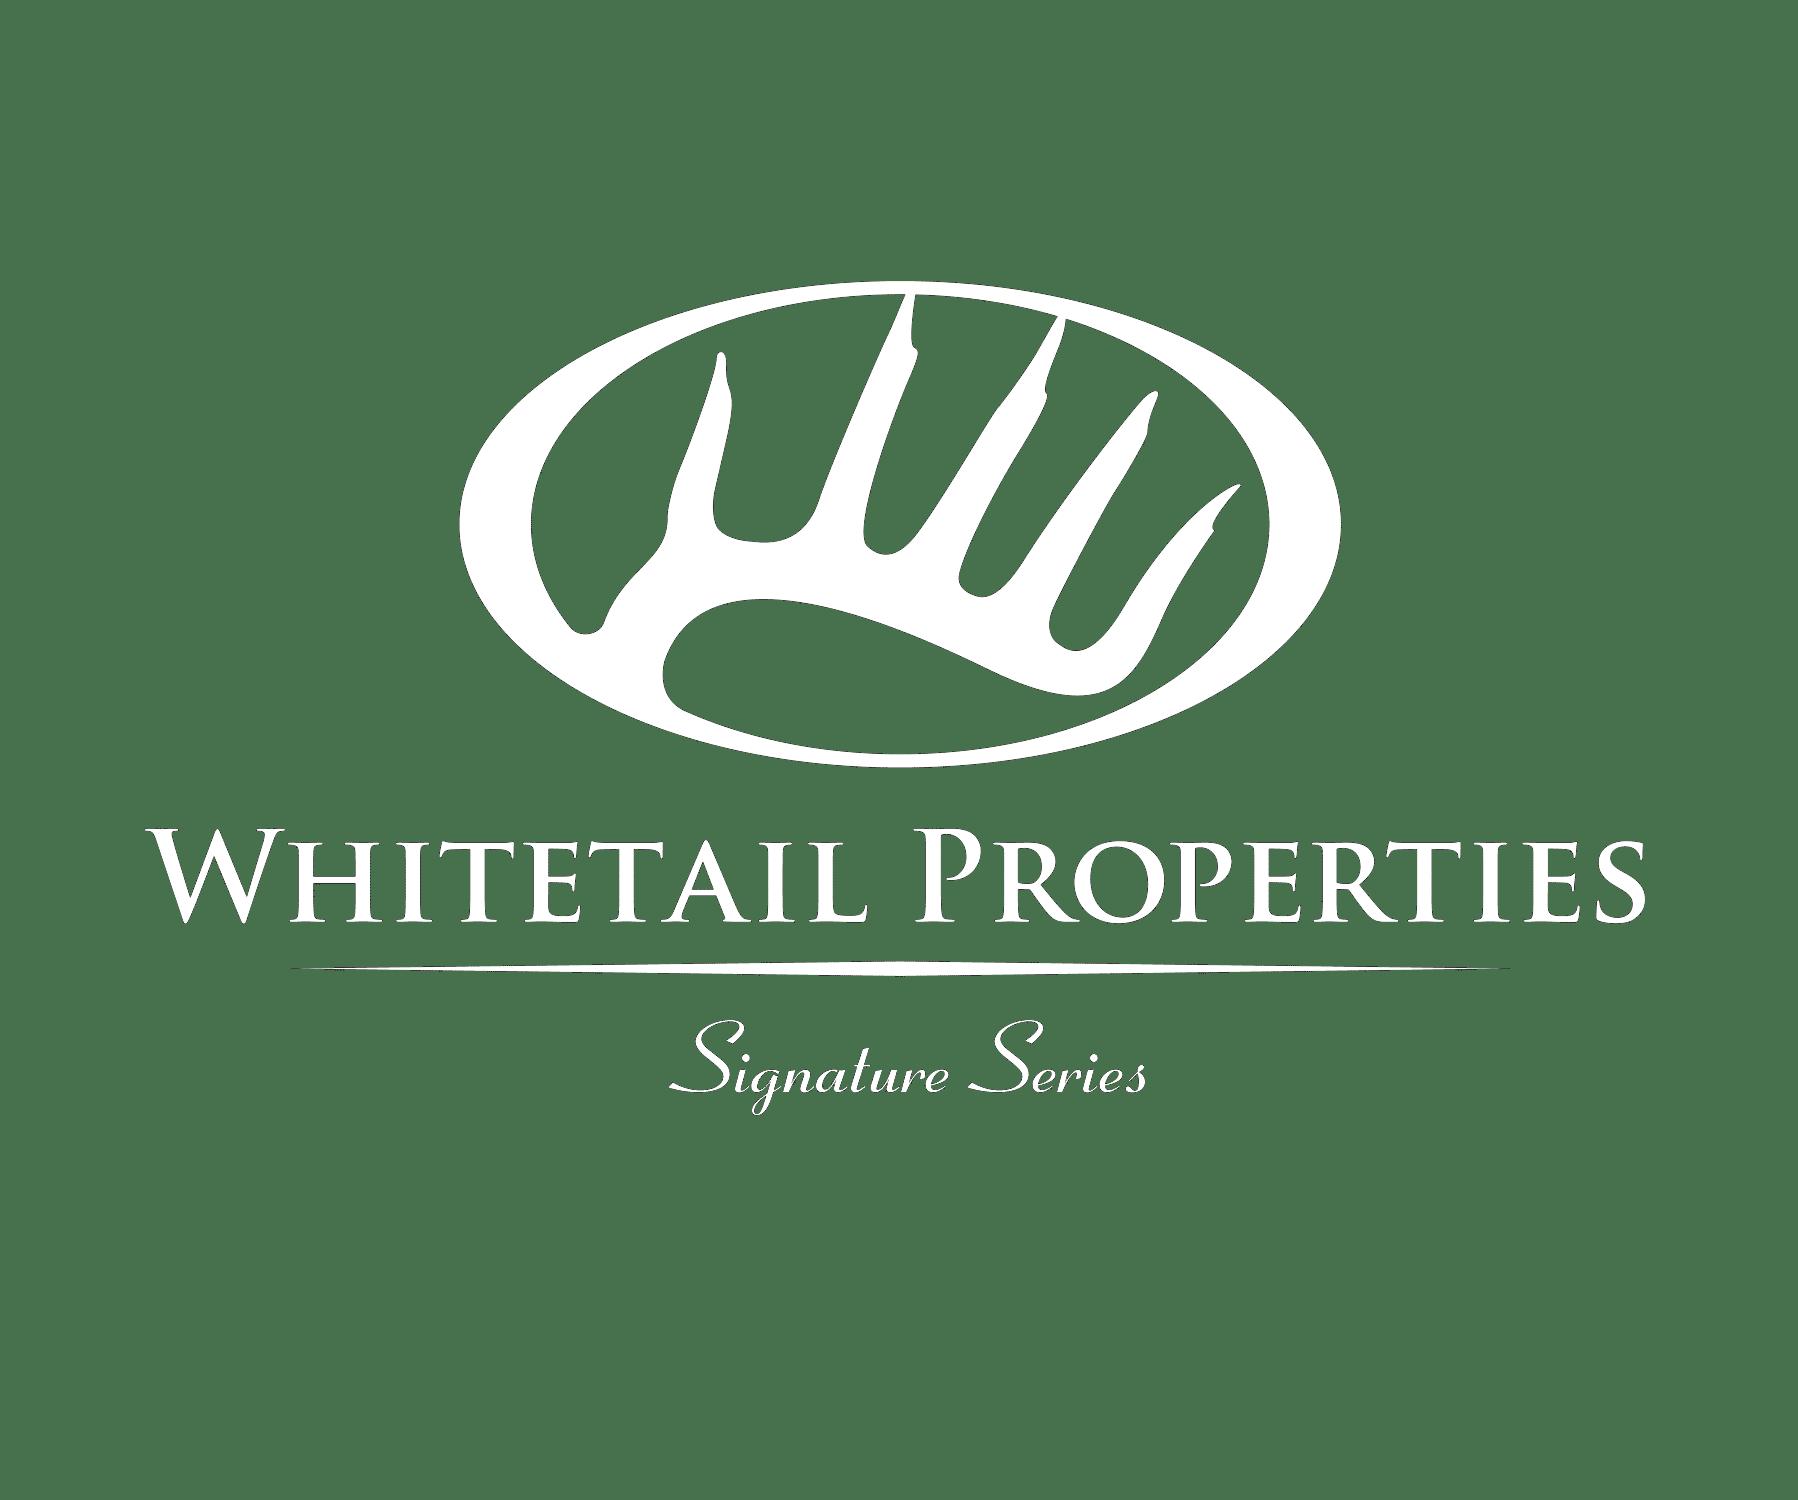 https://i1.wp.com/banksoutdoors.com/wp-content/uploads/2018/01/logo-Signature-seriesn-no-bkgrd-white.png?ssl=1